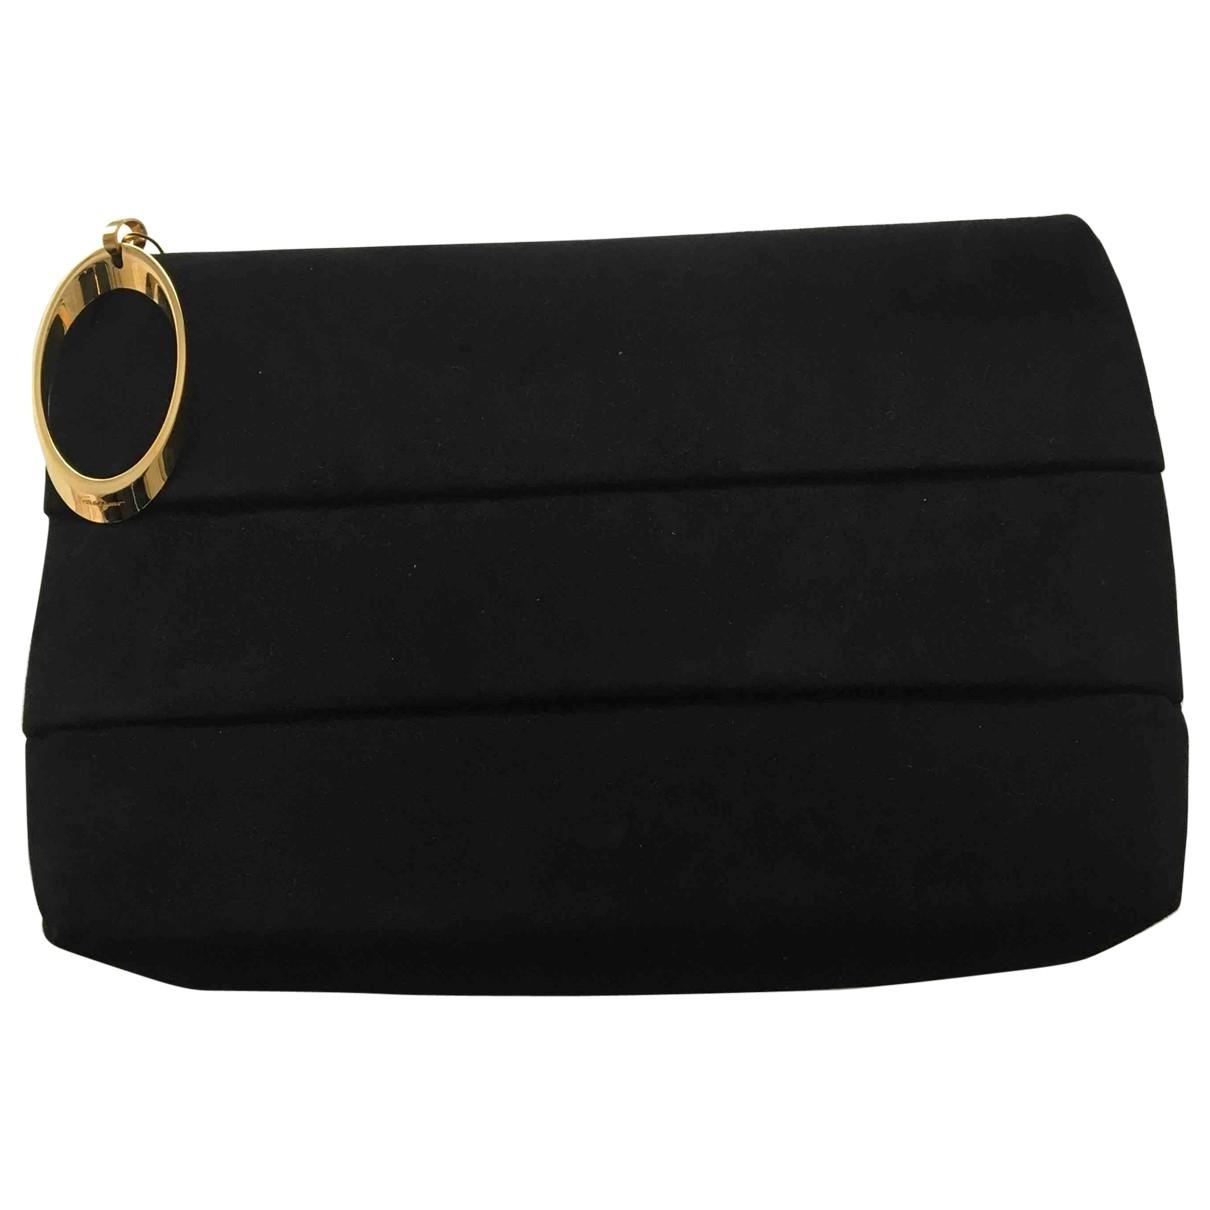 Salvatore Ferragamo \N Black Leather Clutch bag for Women \N